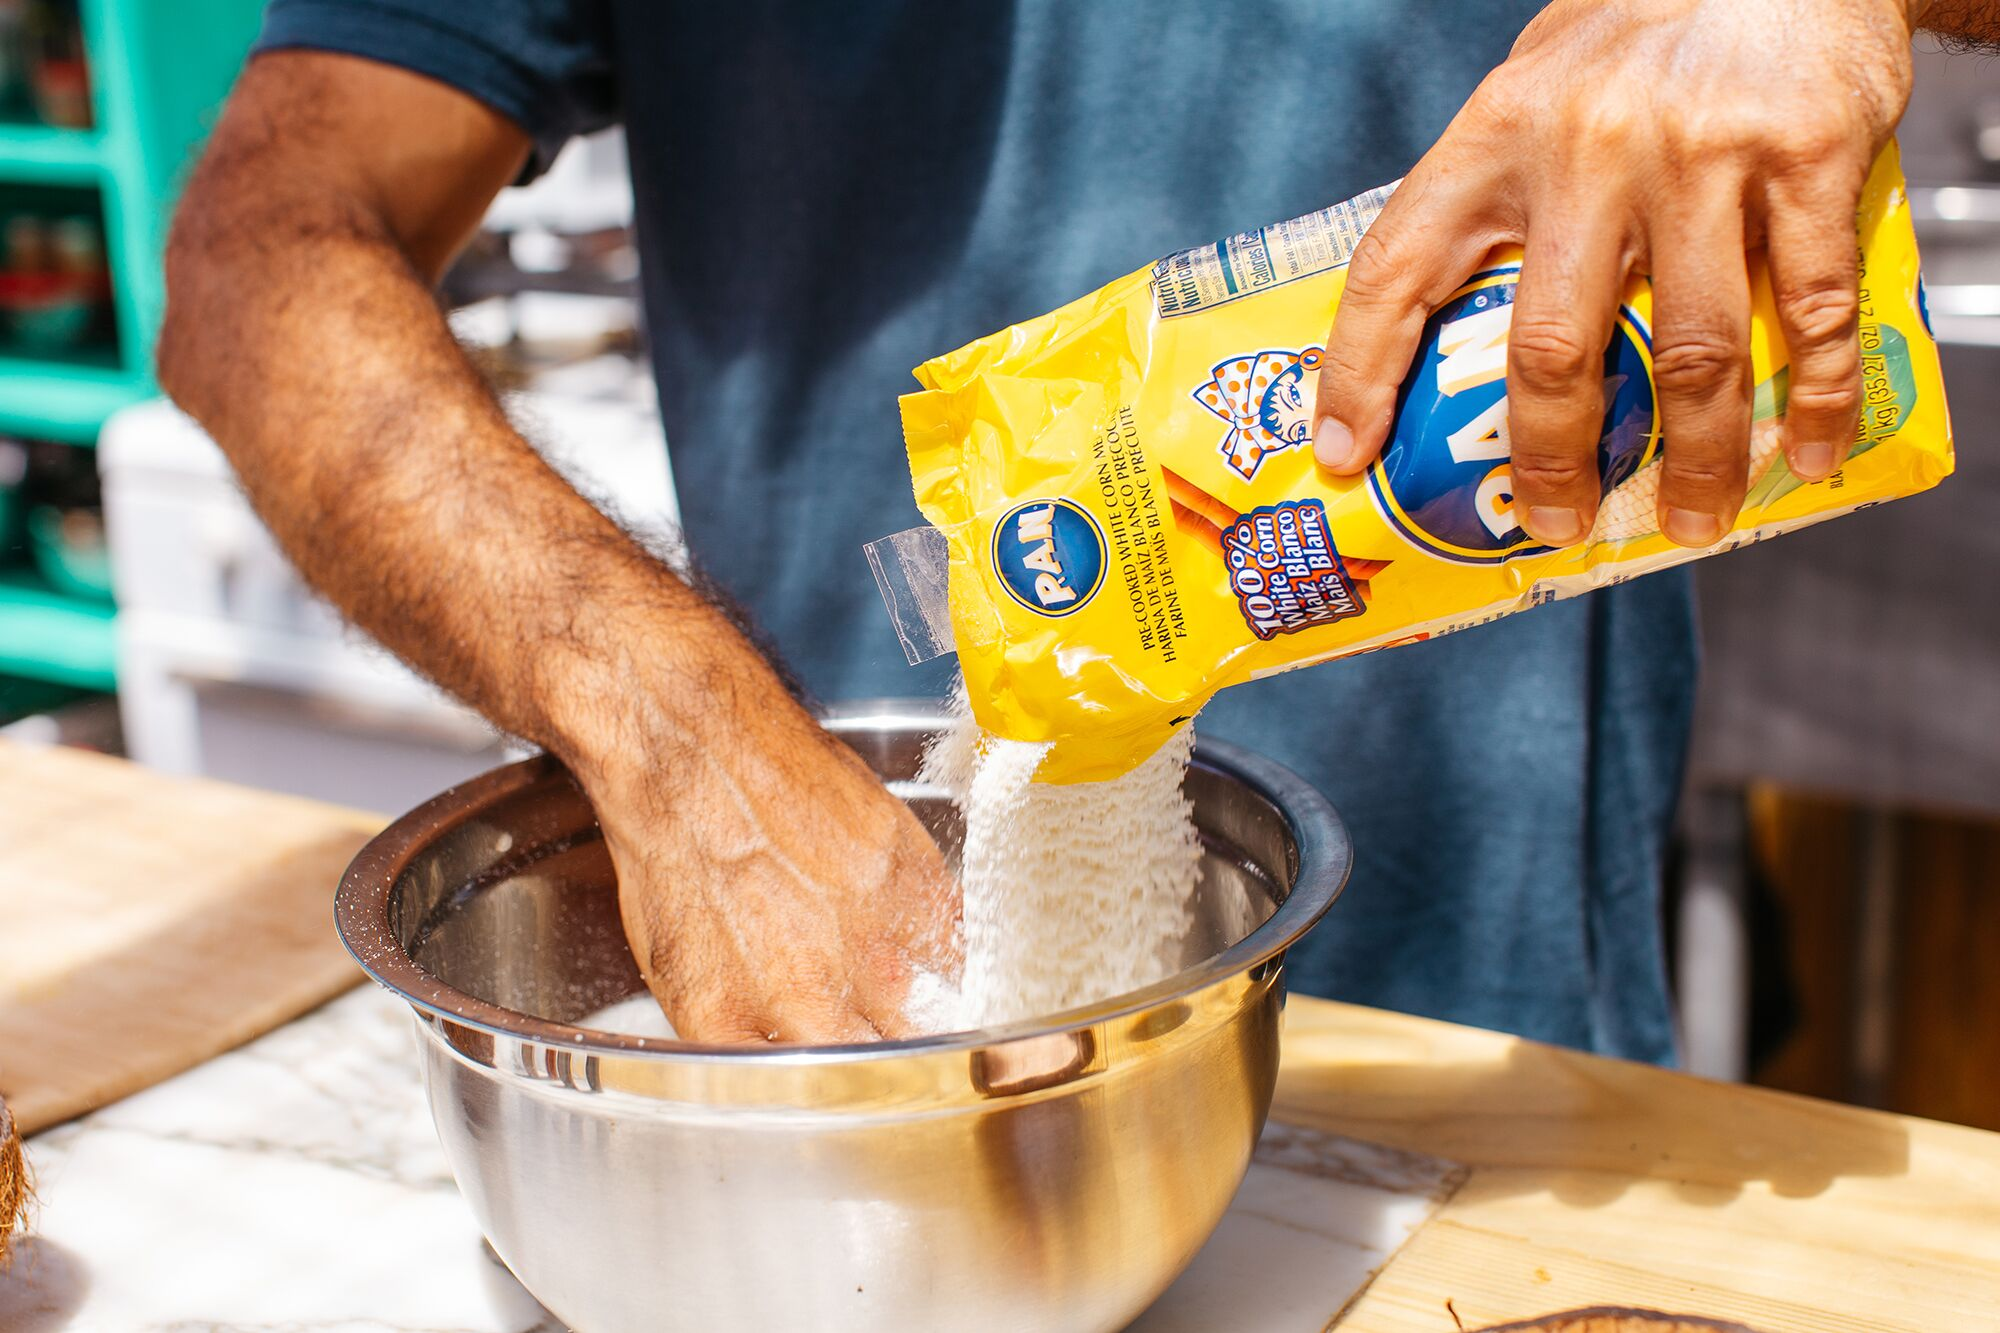 Chef Dario Tani pours cornmeal for arepas